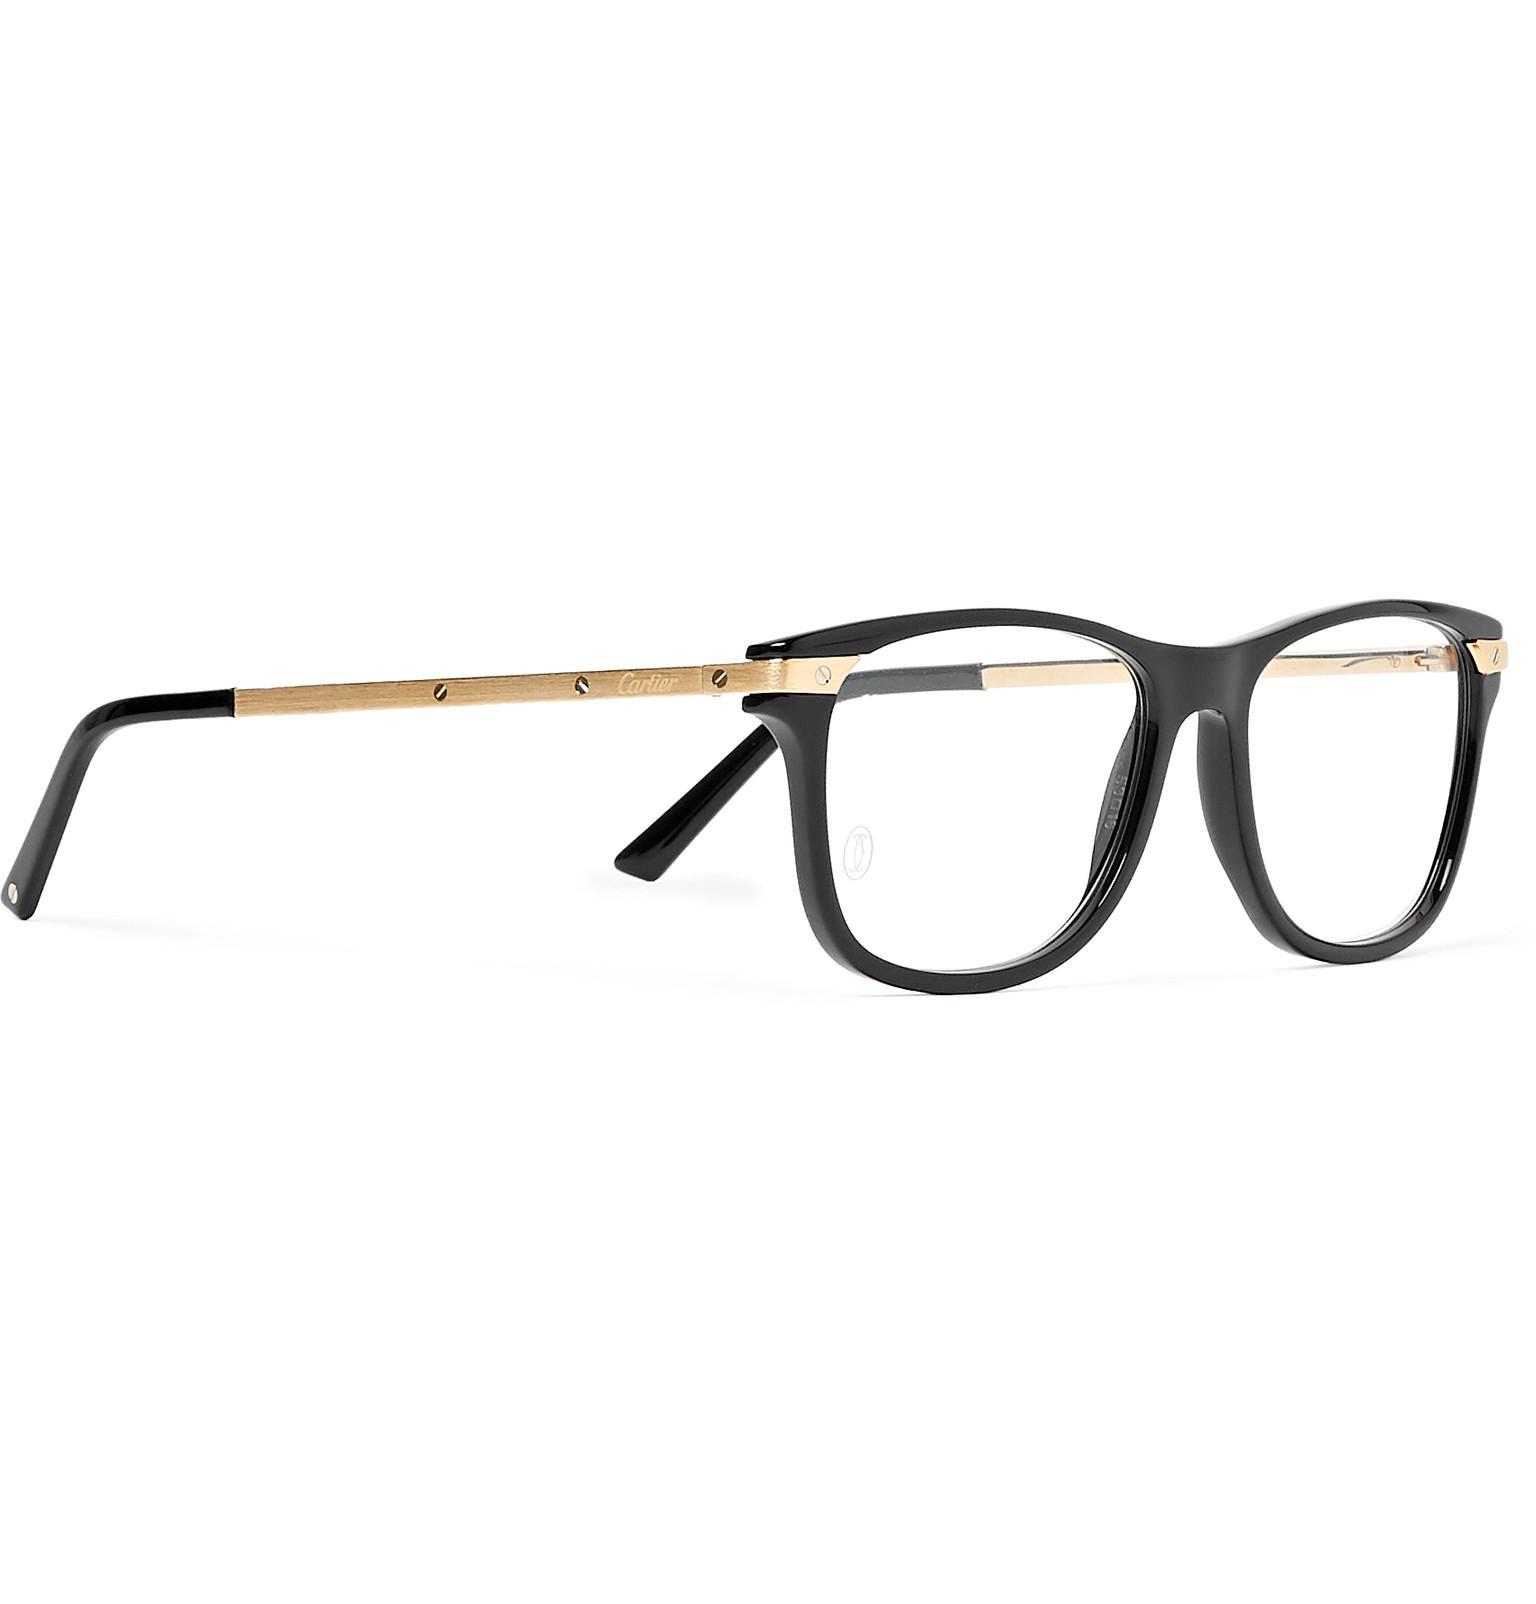 cec117d9eb Cartier - Black Square-frame Acetate And Gold-tone Optical Glasses for Men  -. View fullscreen